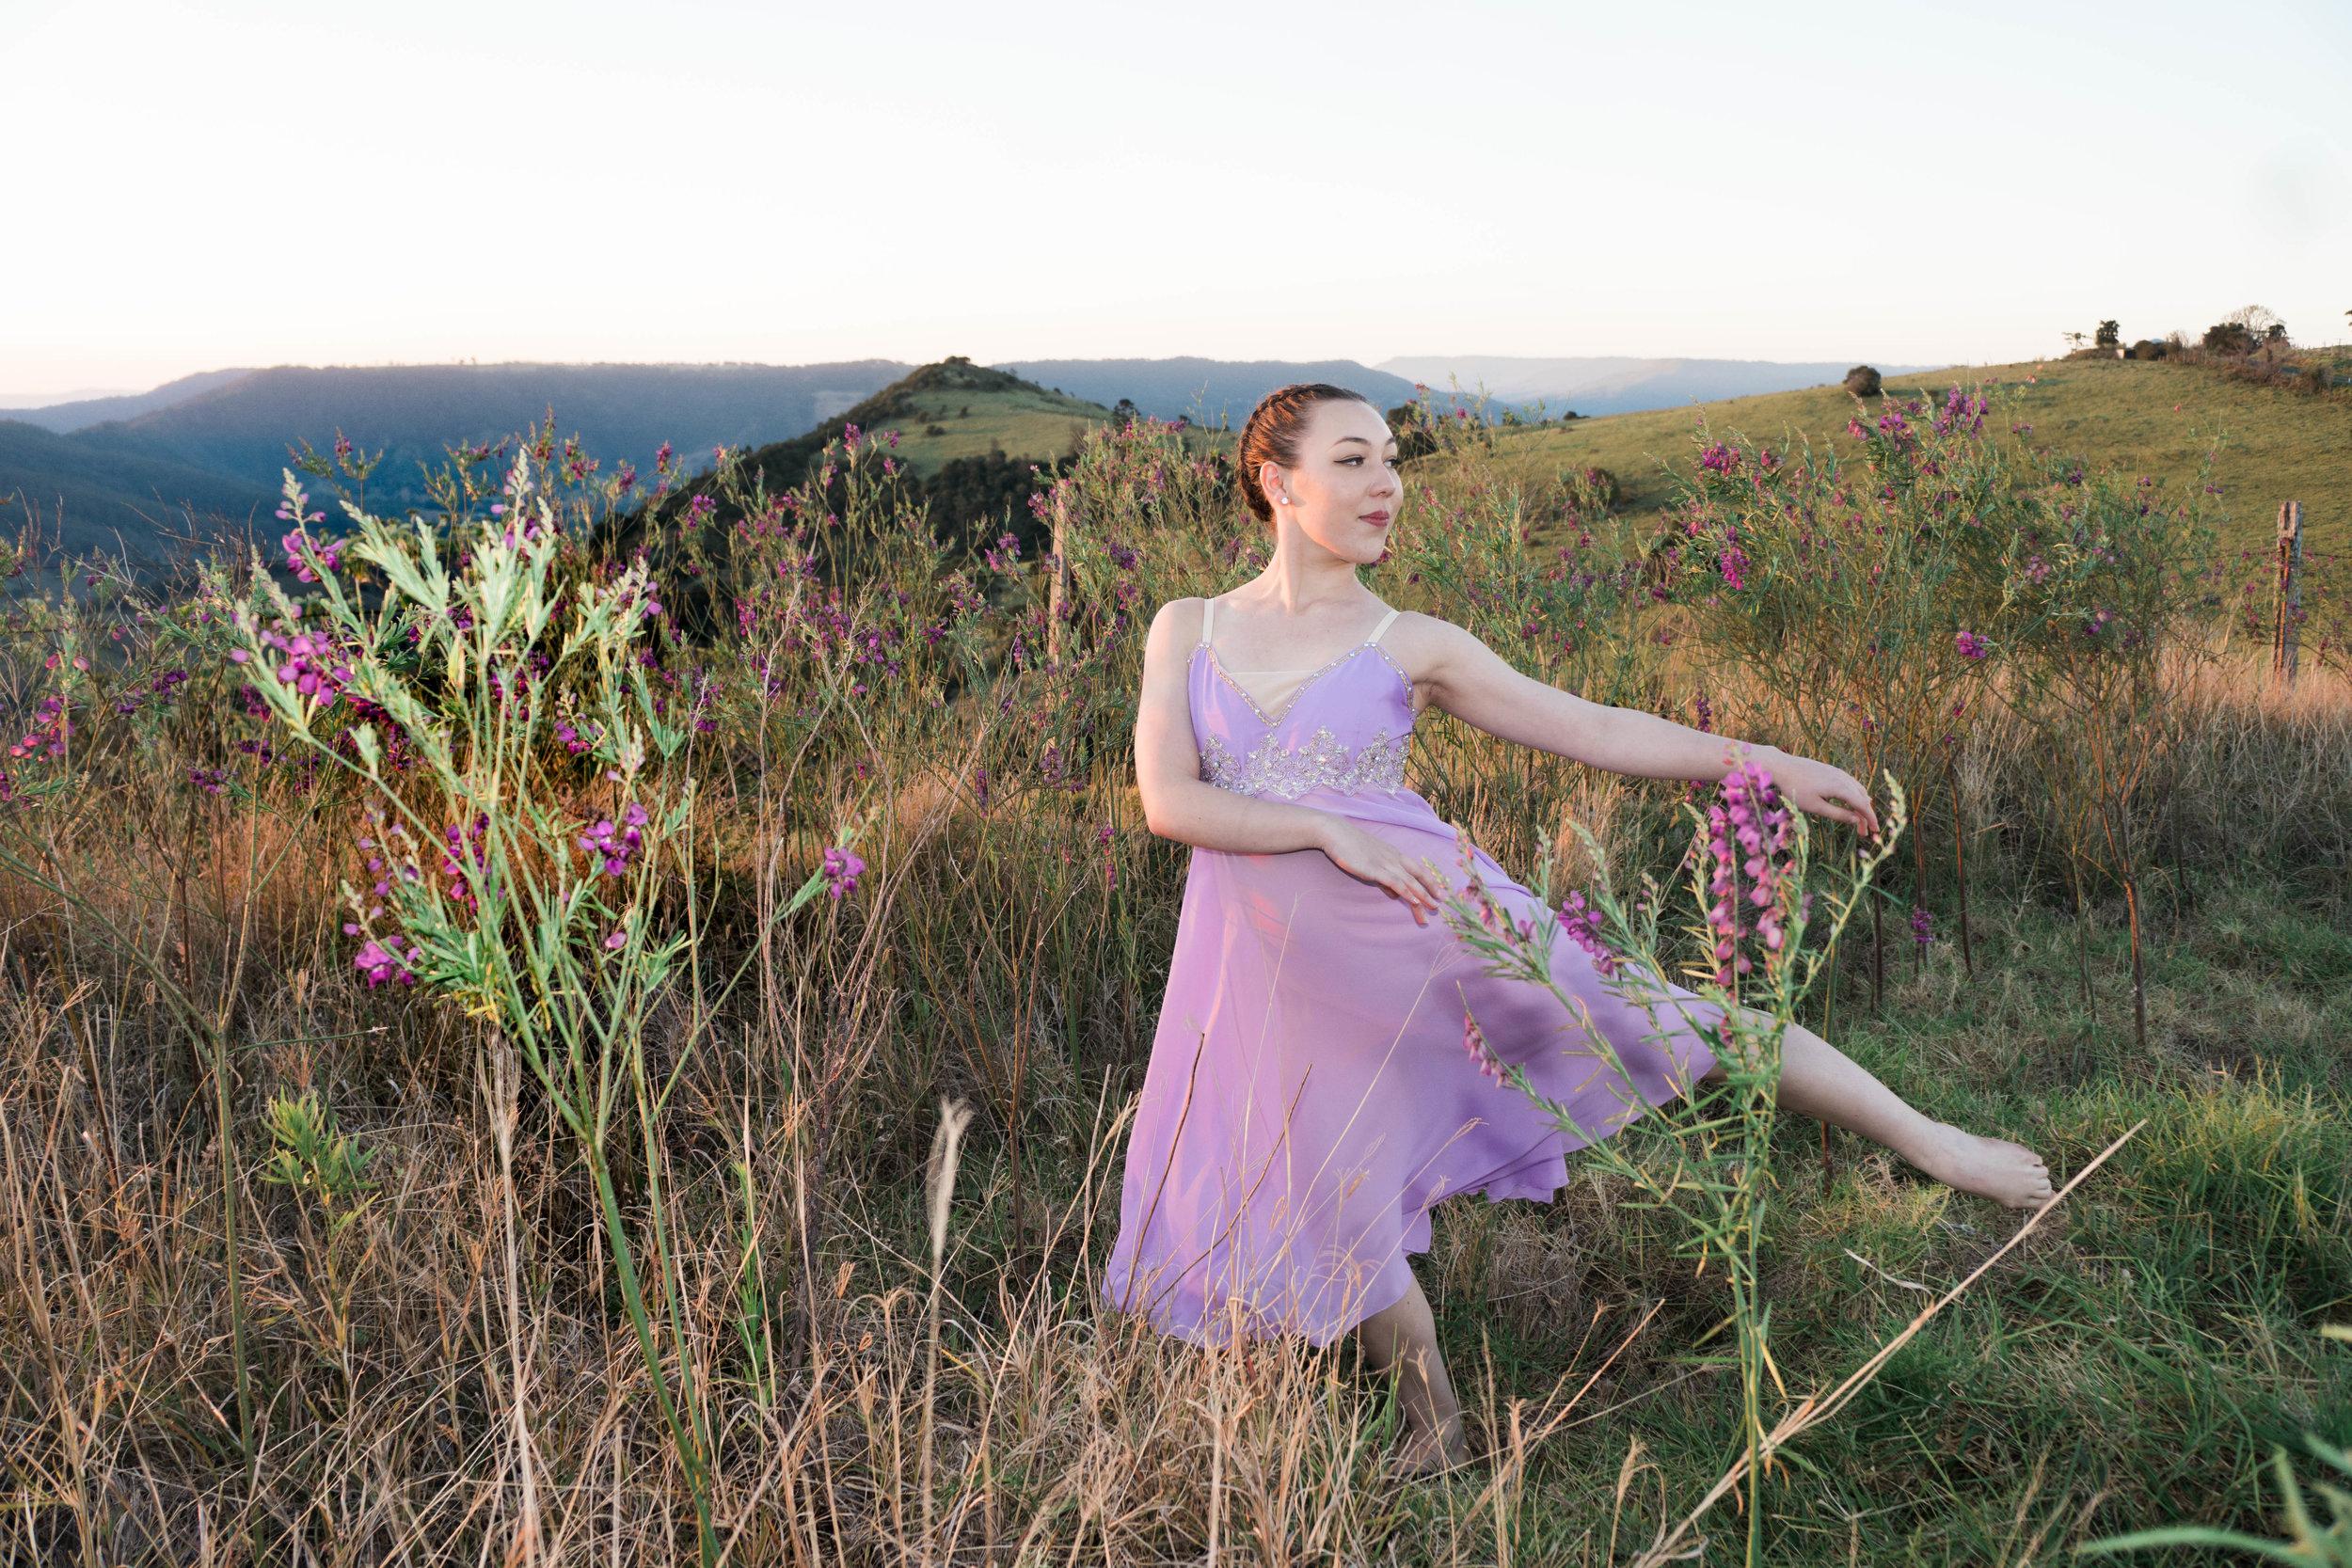 Hinterland-Dance-20.08.17-48.jpg